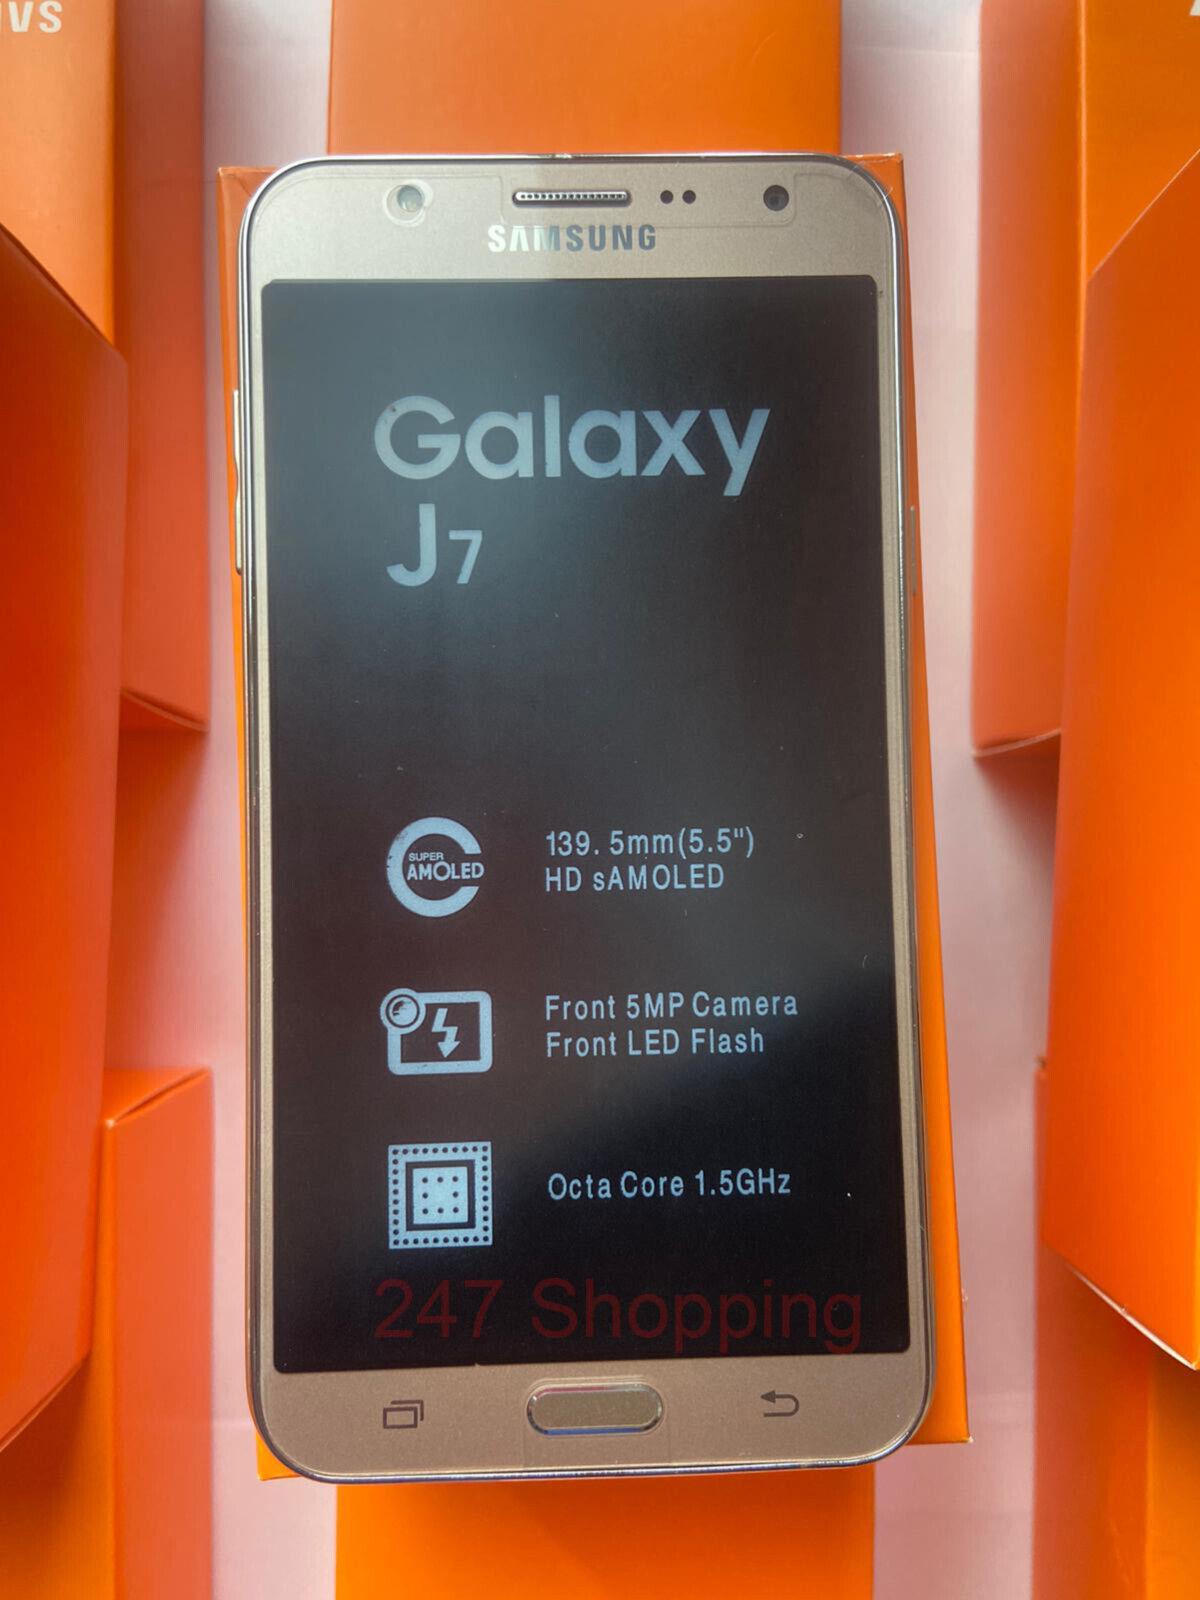 "Android Phone - Samsung Galaxy J7 SM-J700 5.5"" Dual SIM 4G 16GB Android Smart Phone Unlocked UK"